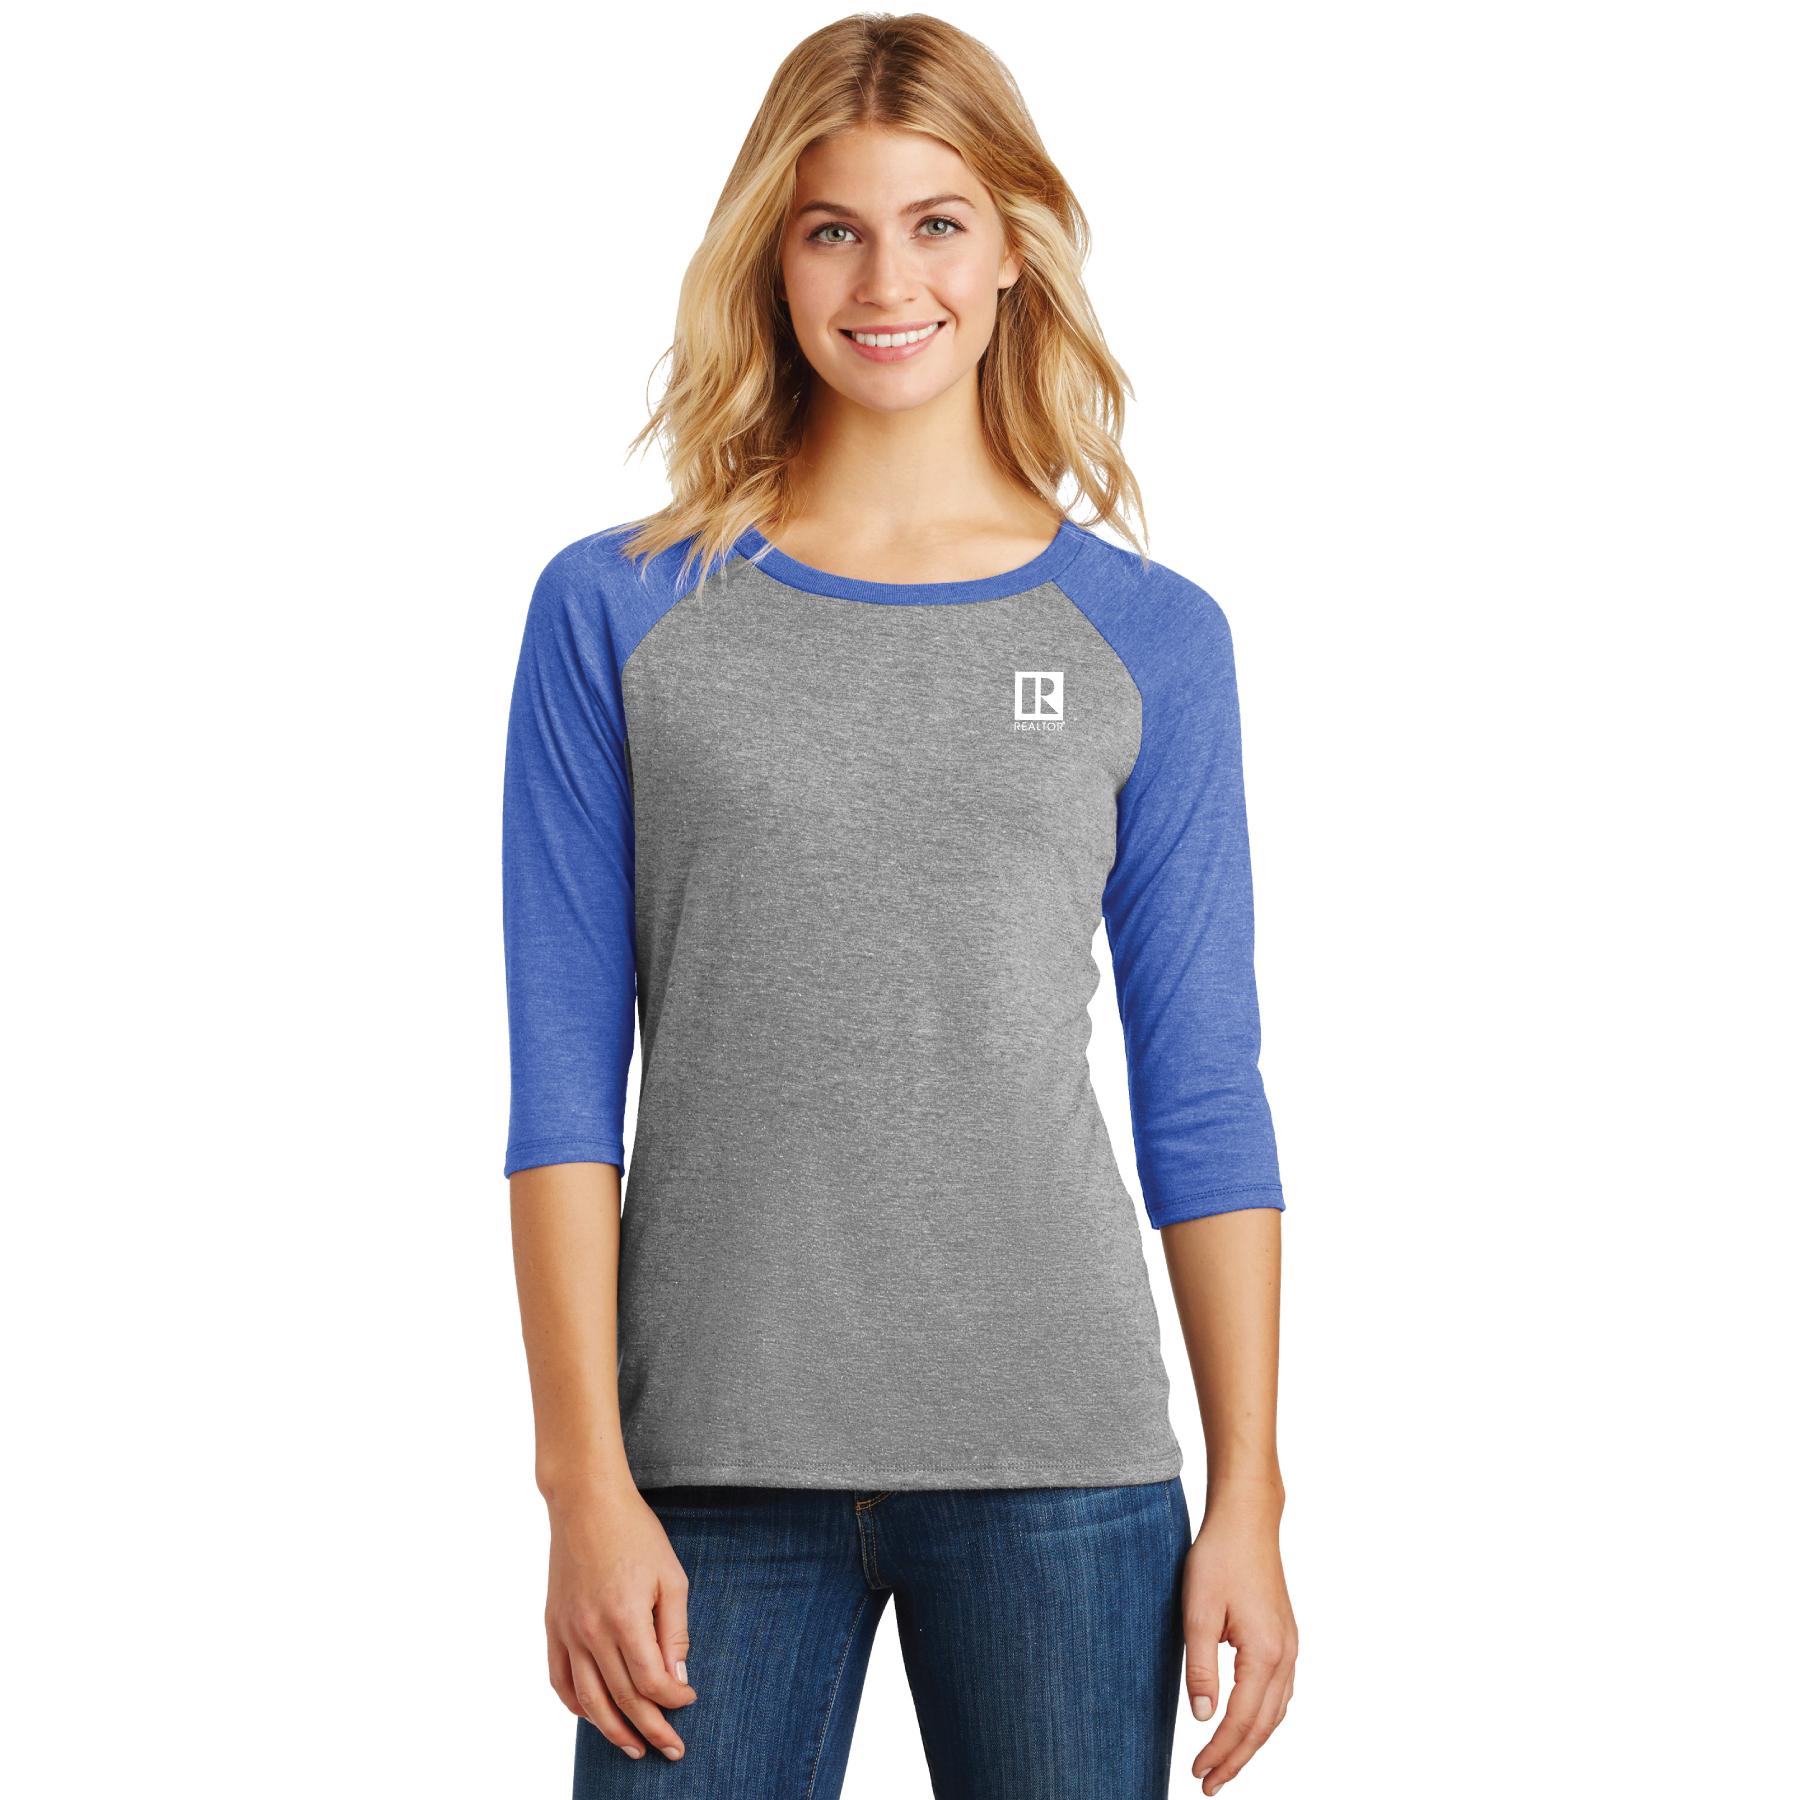 Ladies Perfect Tri® 3/4-Sleeve Raglan ladies, 3/4 sleeves, raglans, baseballs